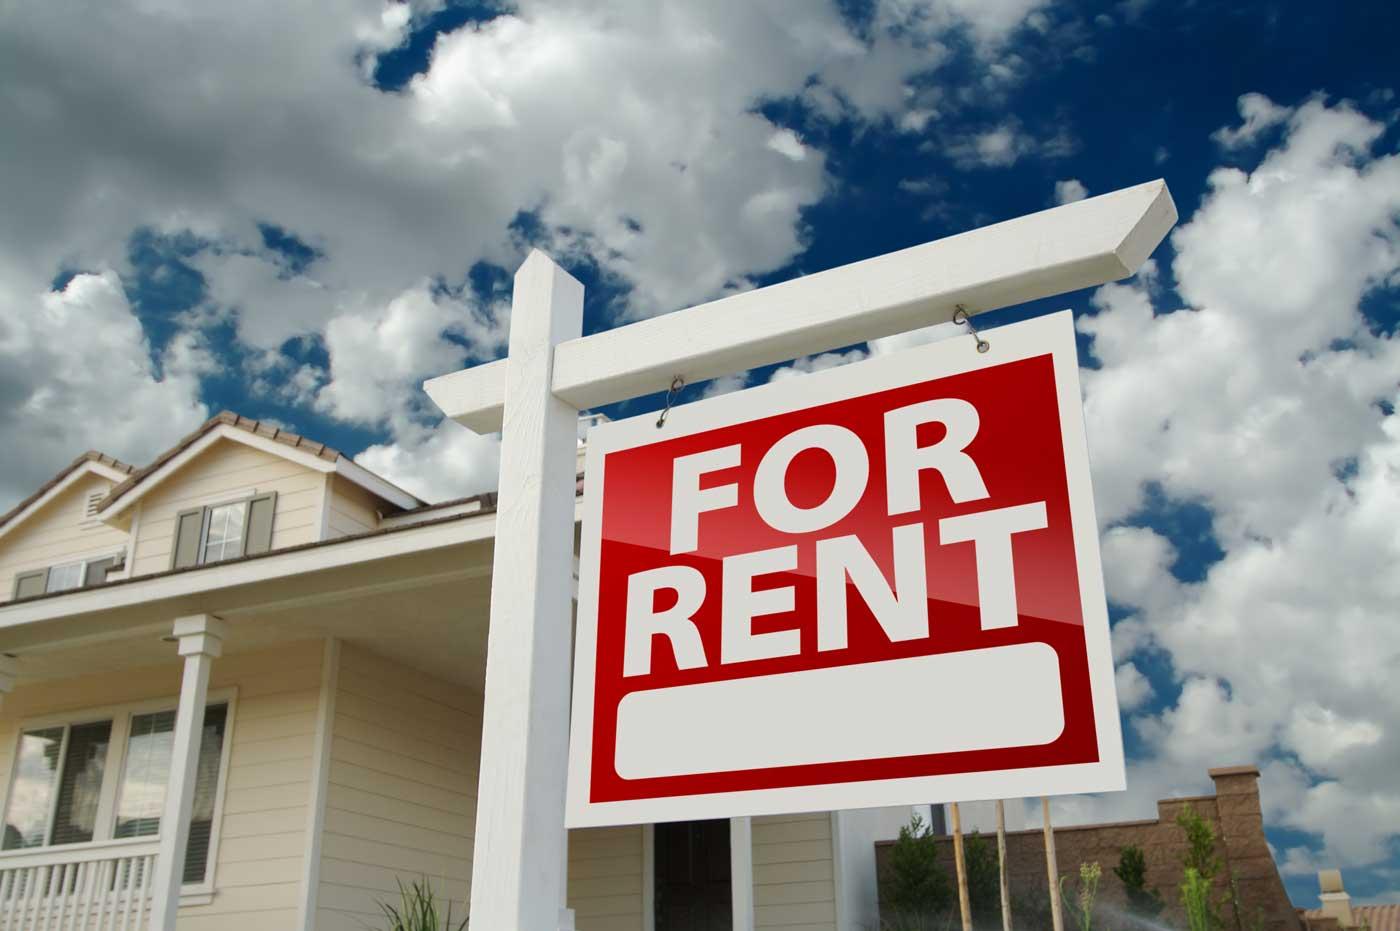 Renters' insurance